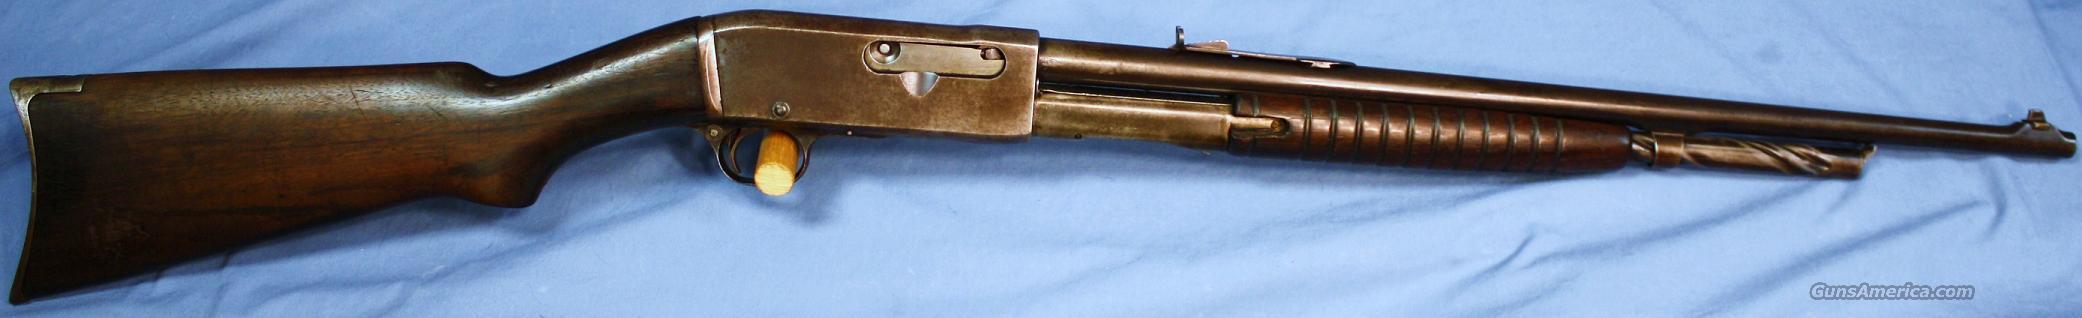 pump action 22 rifle